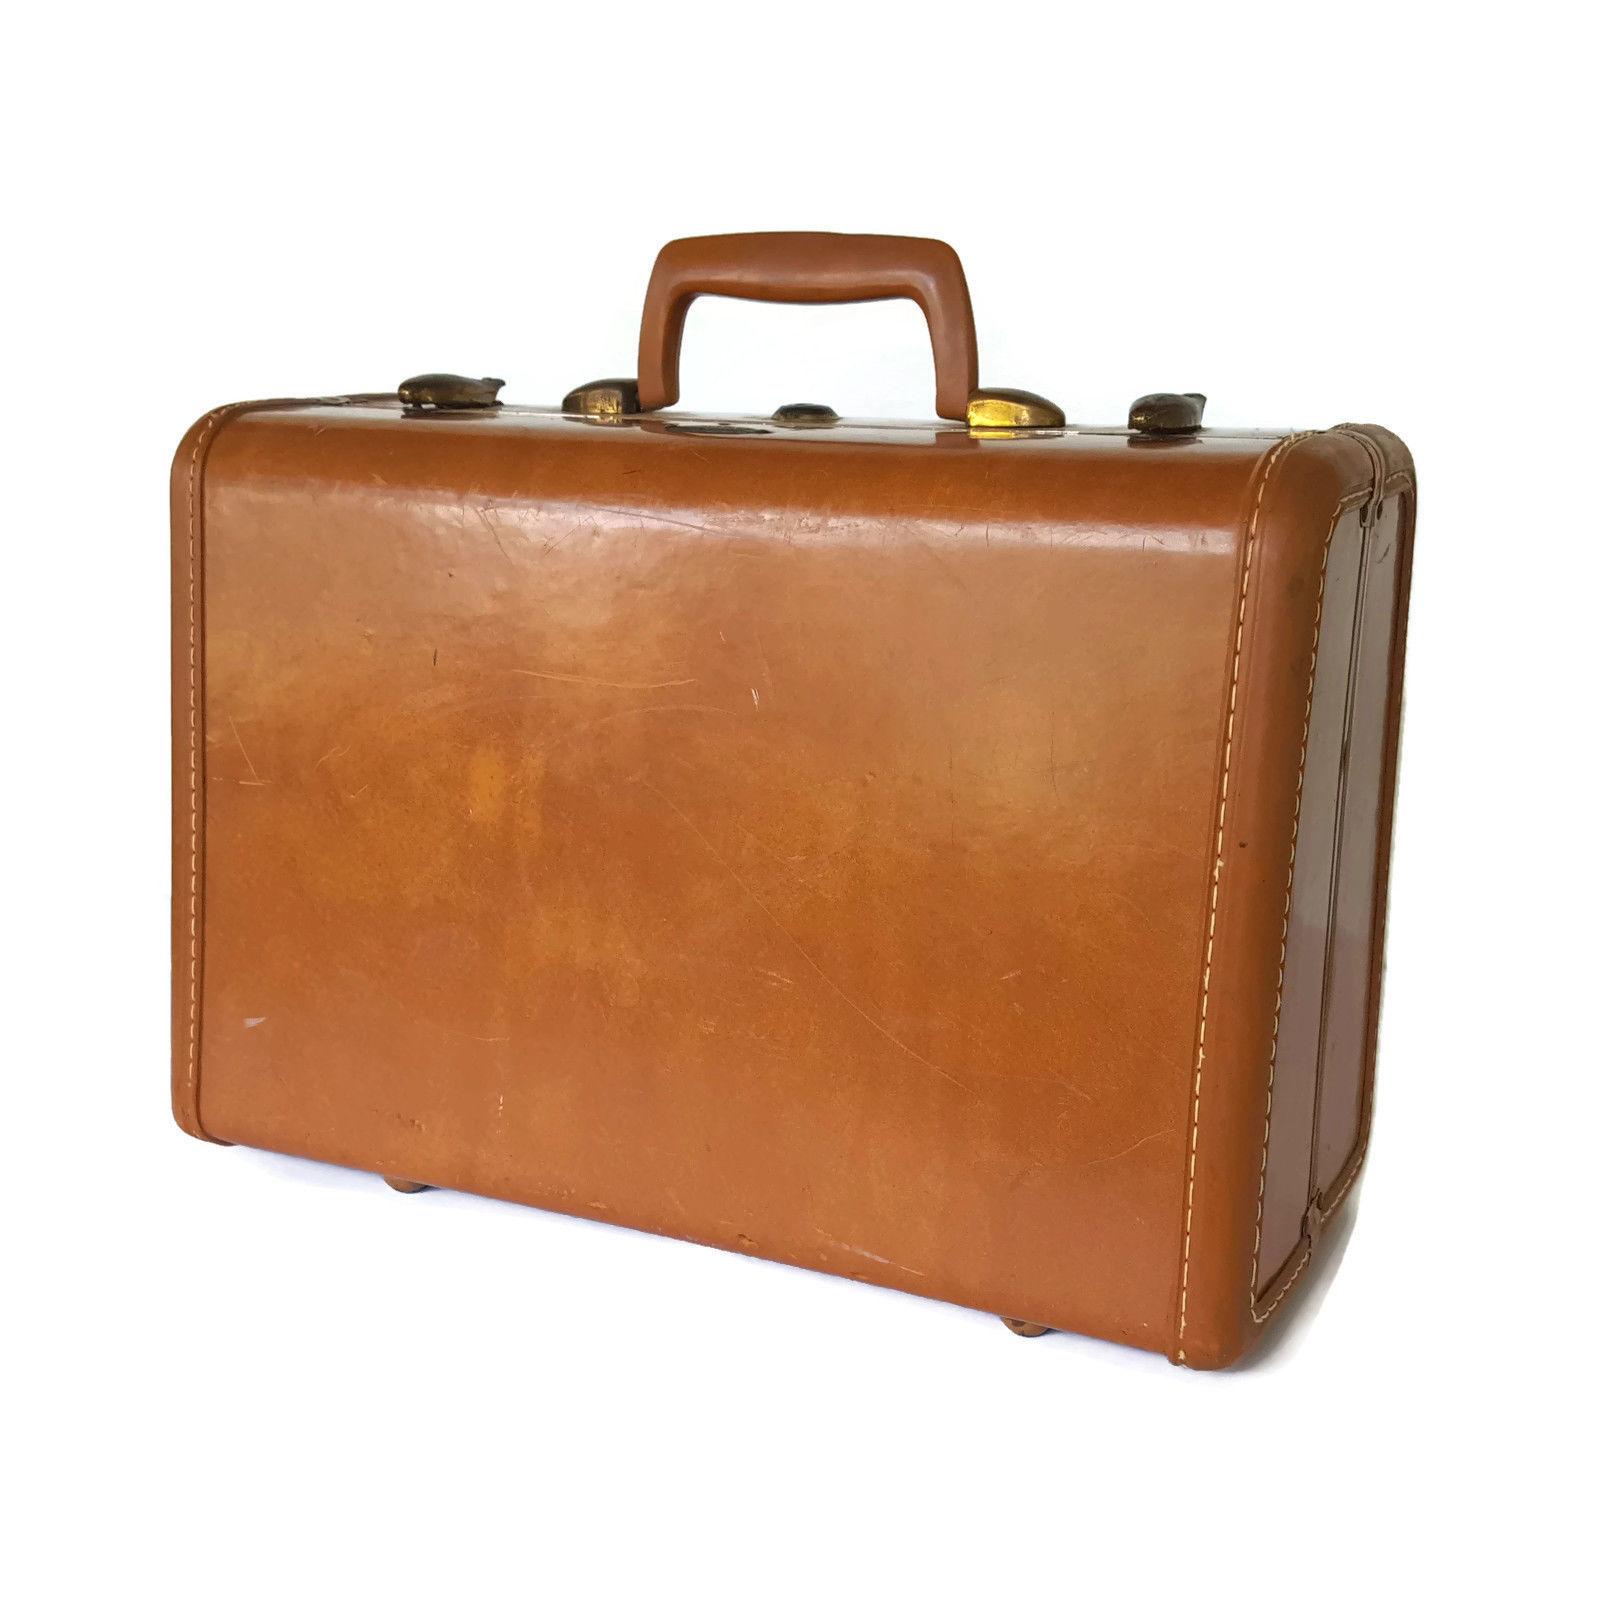 34ff9039cd95 Vintage Samsonite Brown Hardside Suitcase Small Train Case Luggage 15